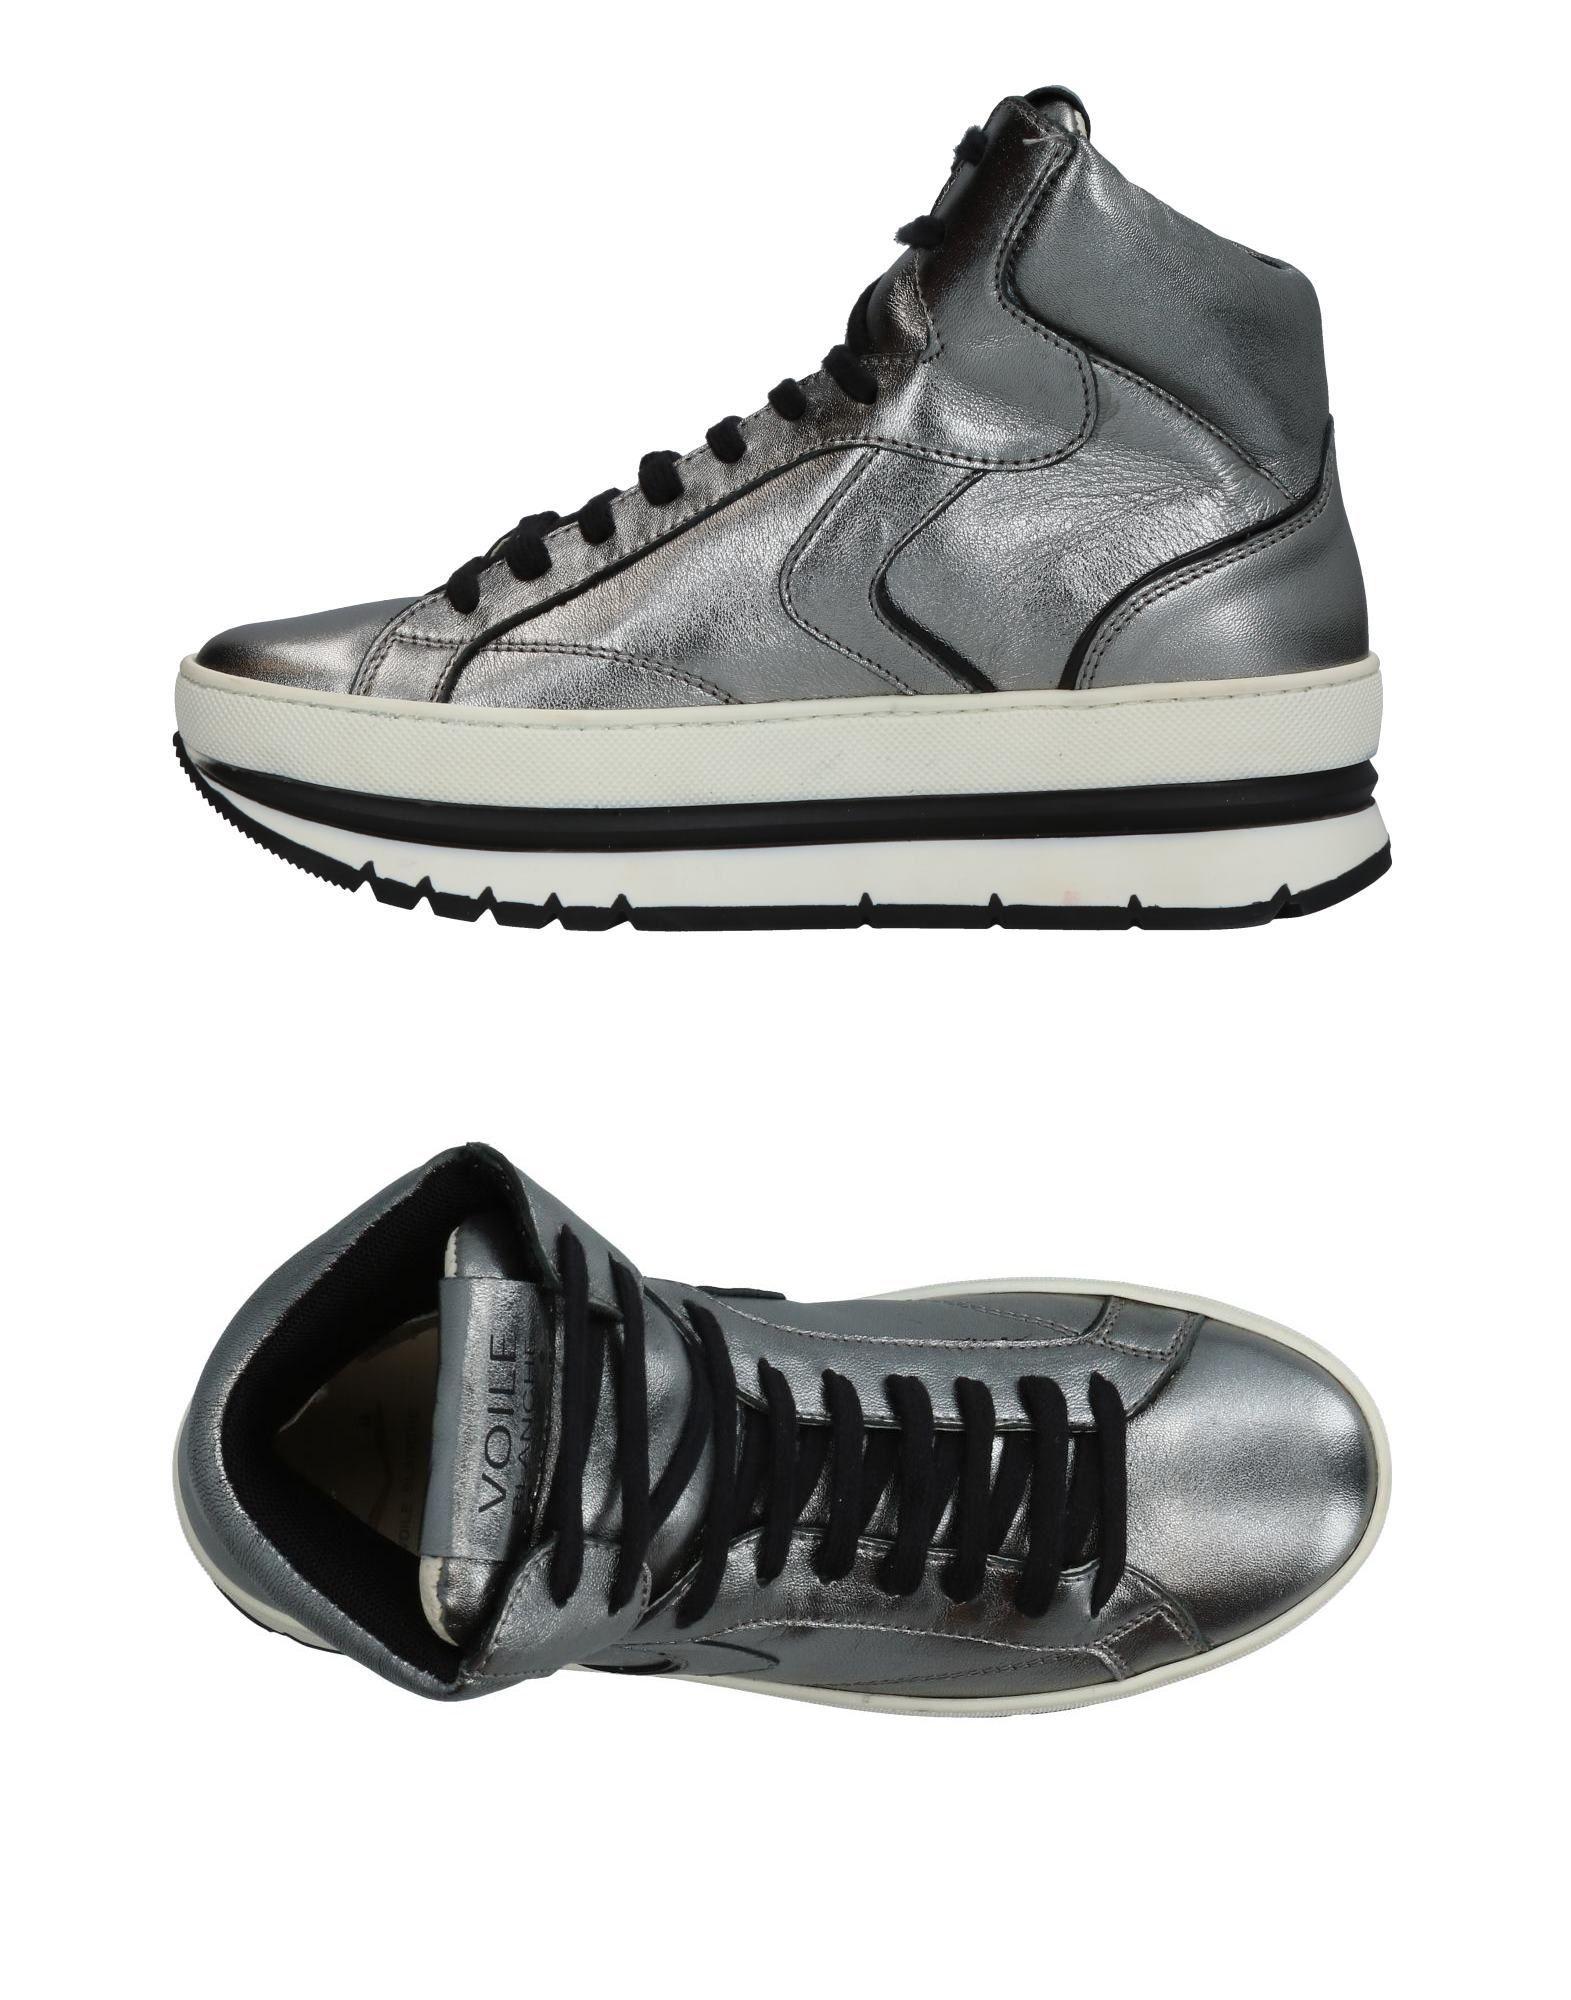 Stilvolle billige Schuhe Voile Blanche Sneakers Damen  11337876NG